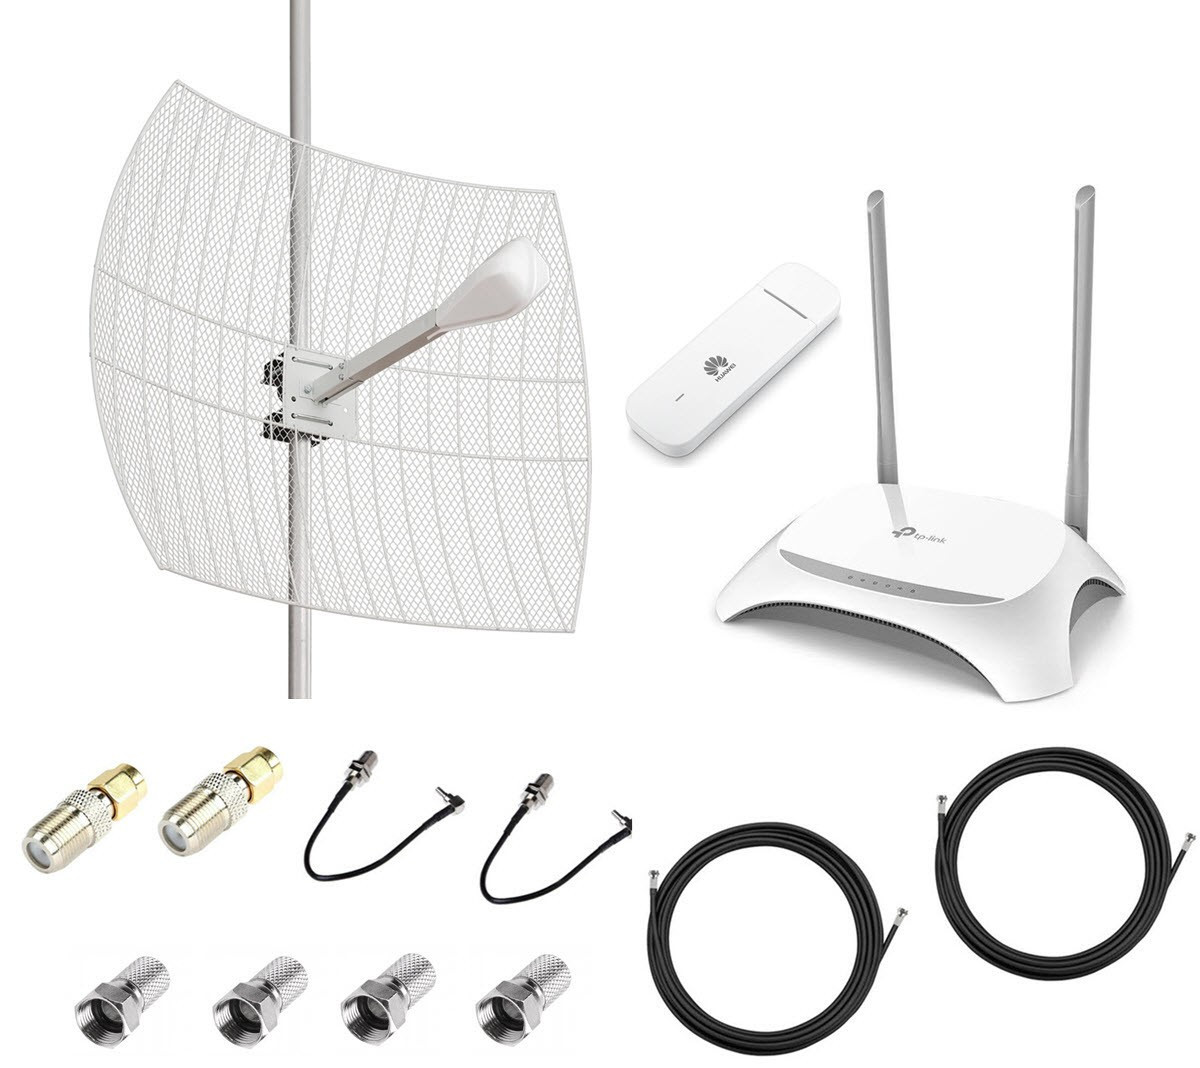 4G интернет комплект параболик Kroks для дома